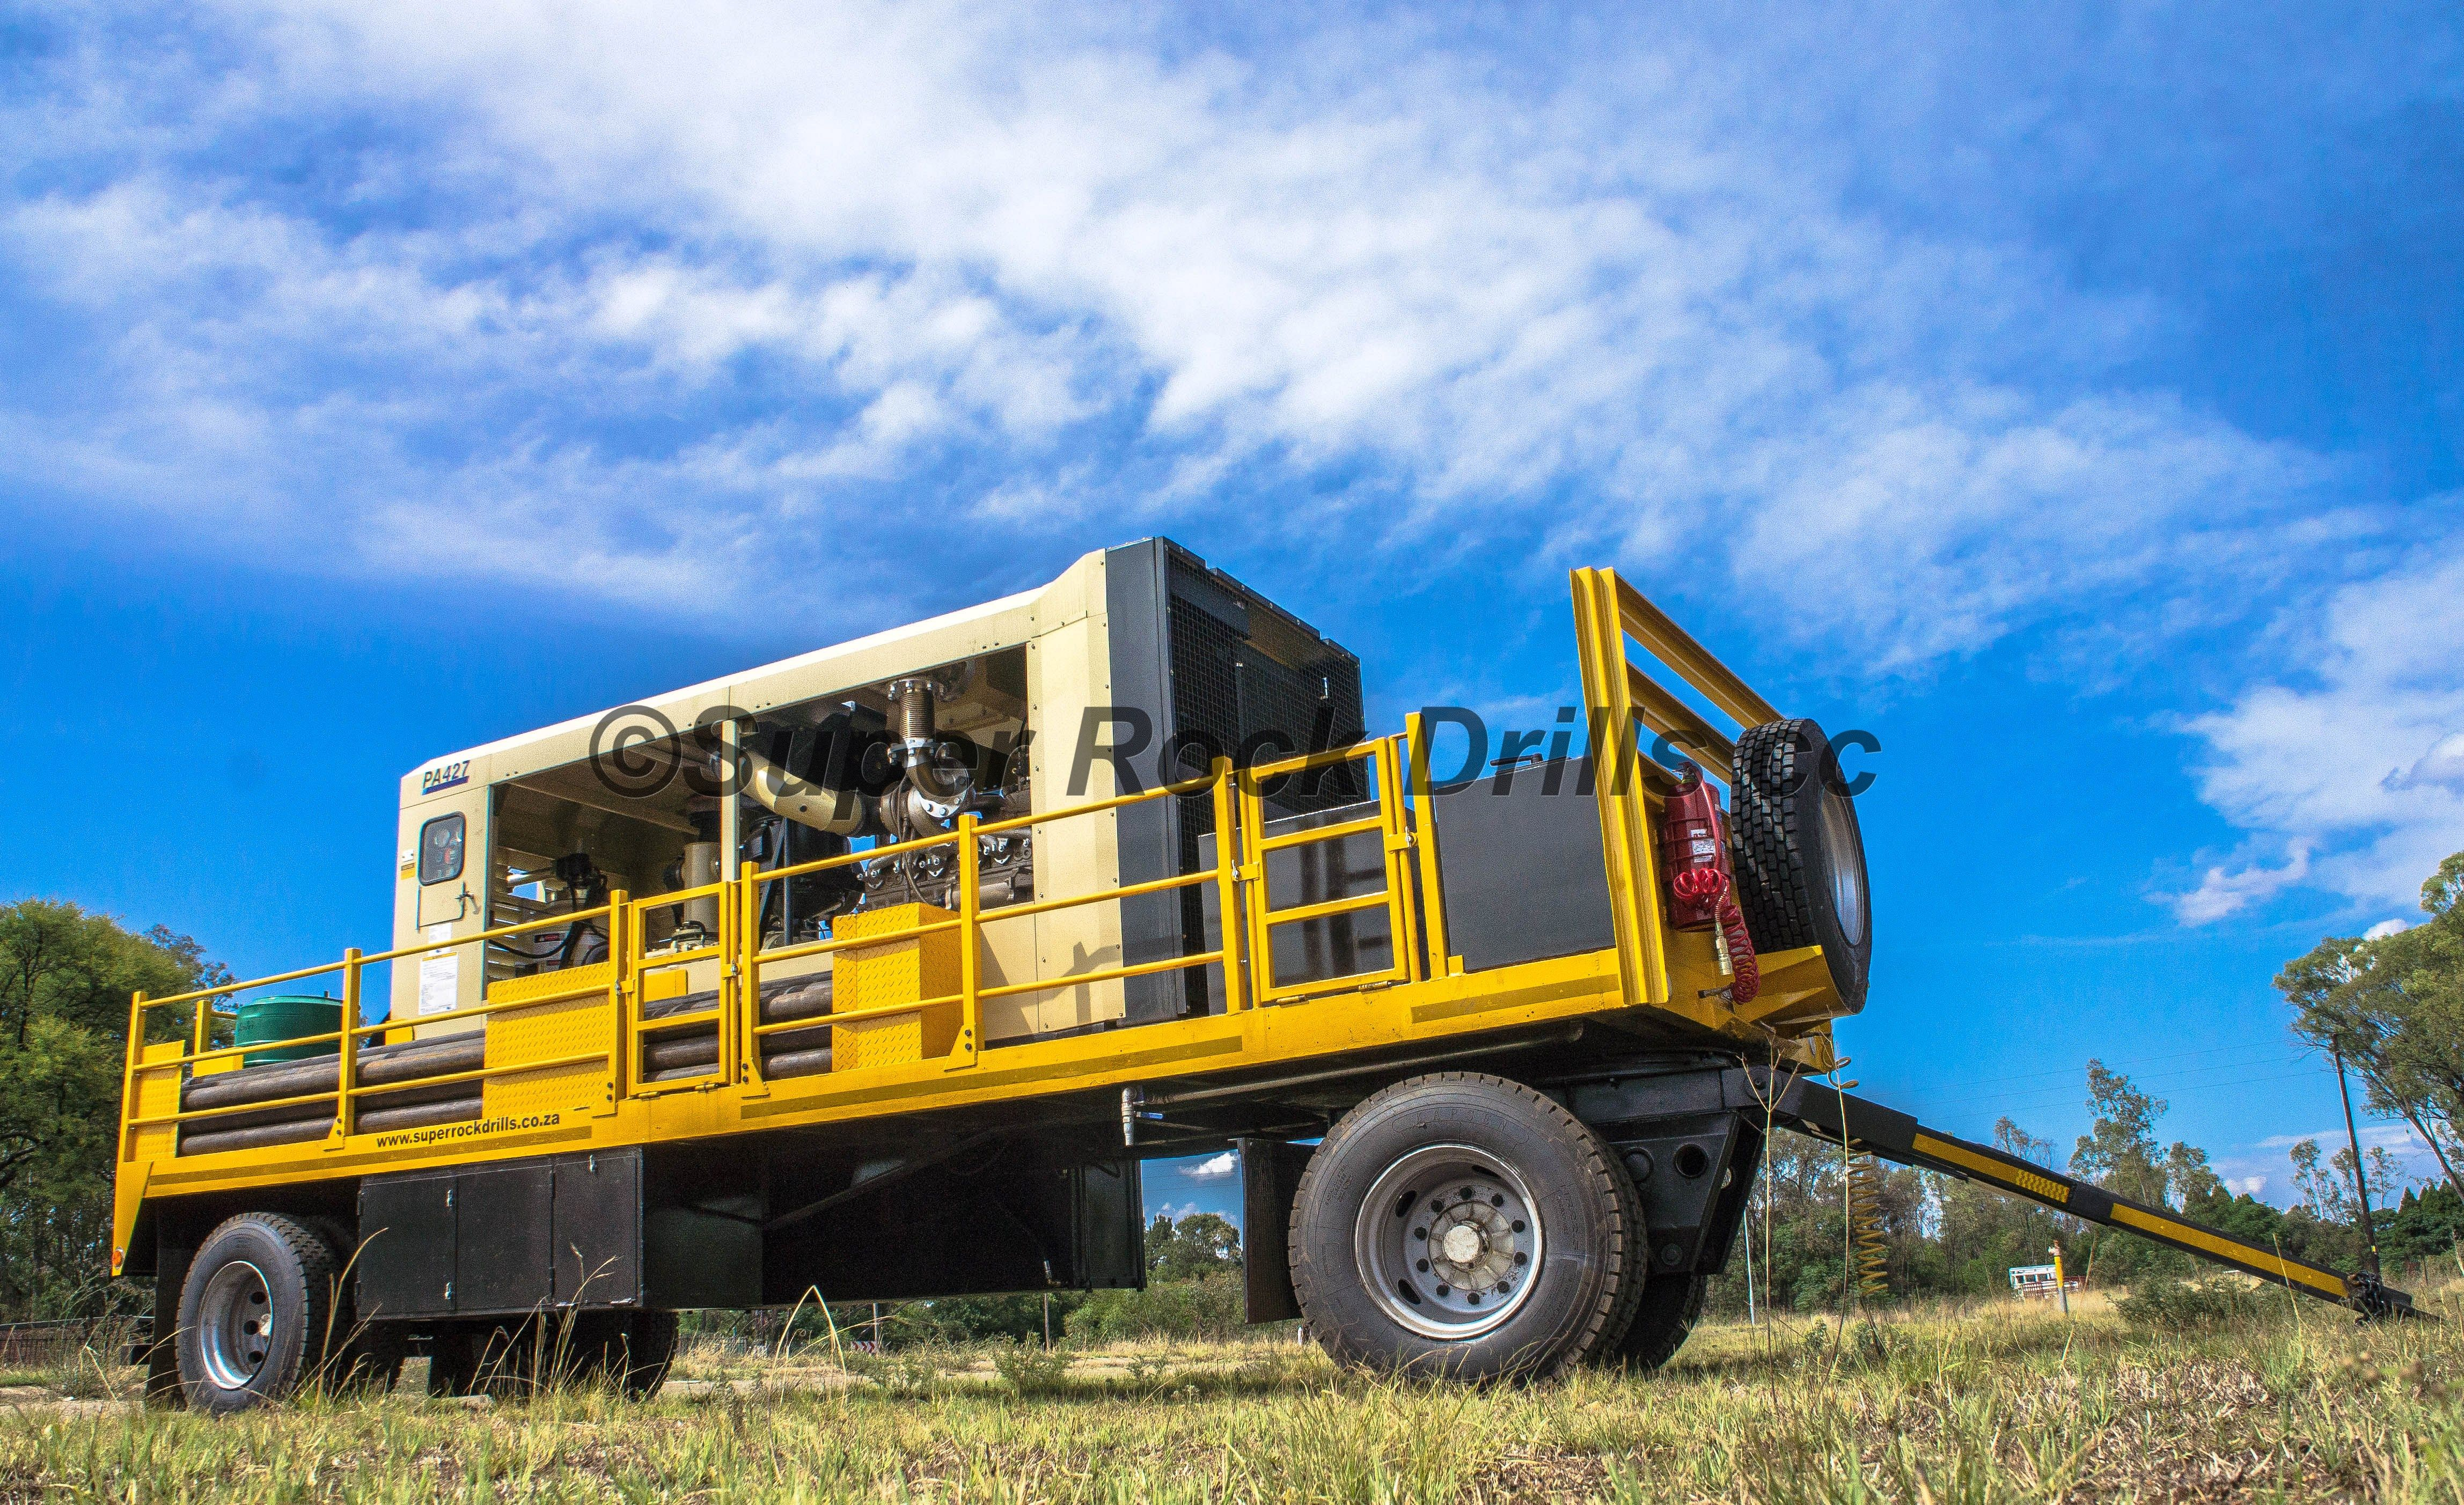 A Doosan compressor mounted onto a trailer. Drilling rig